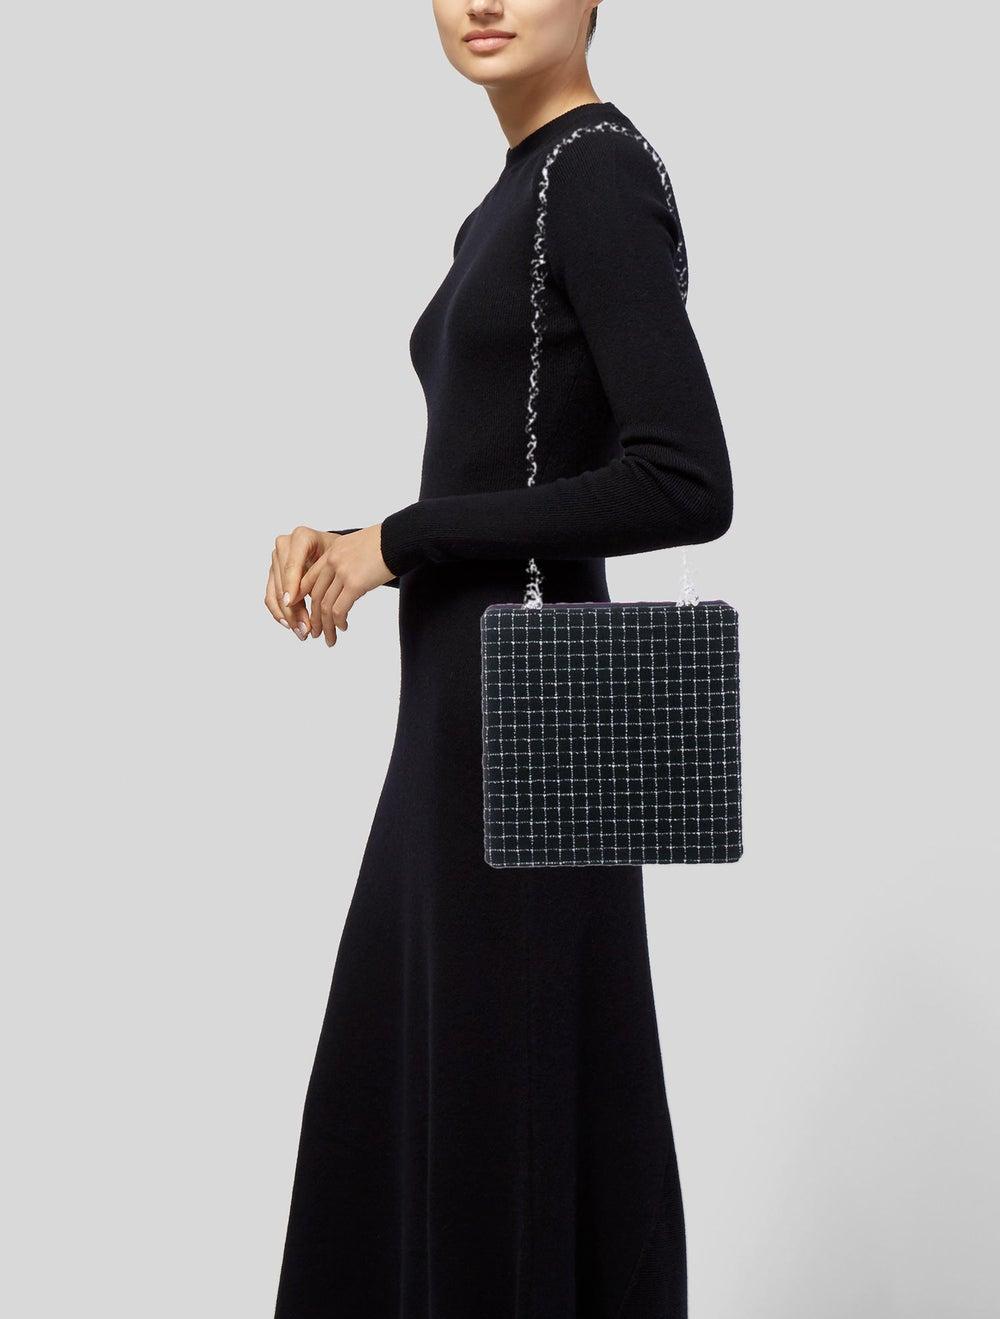 Chanel Chain Fantasy Tweed Bag Black - image 2